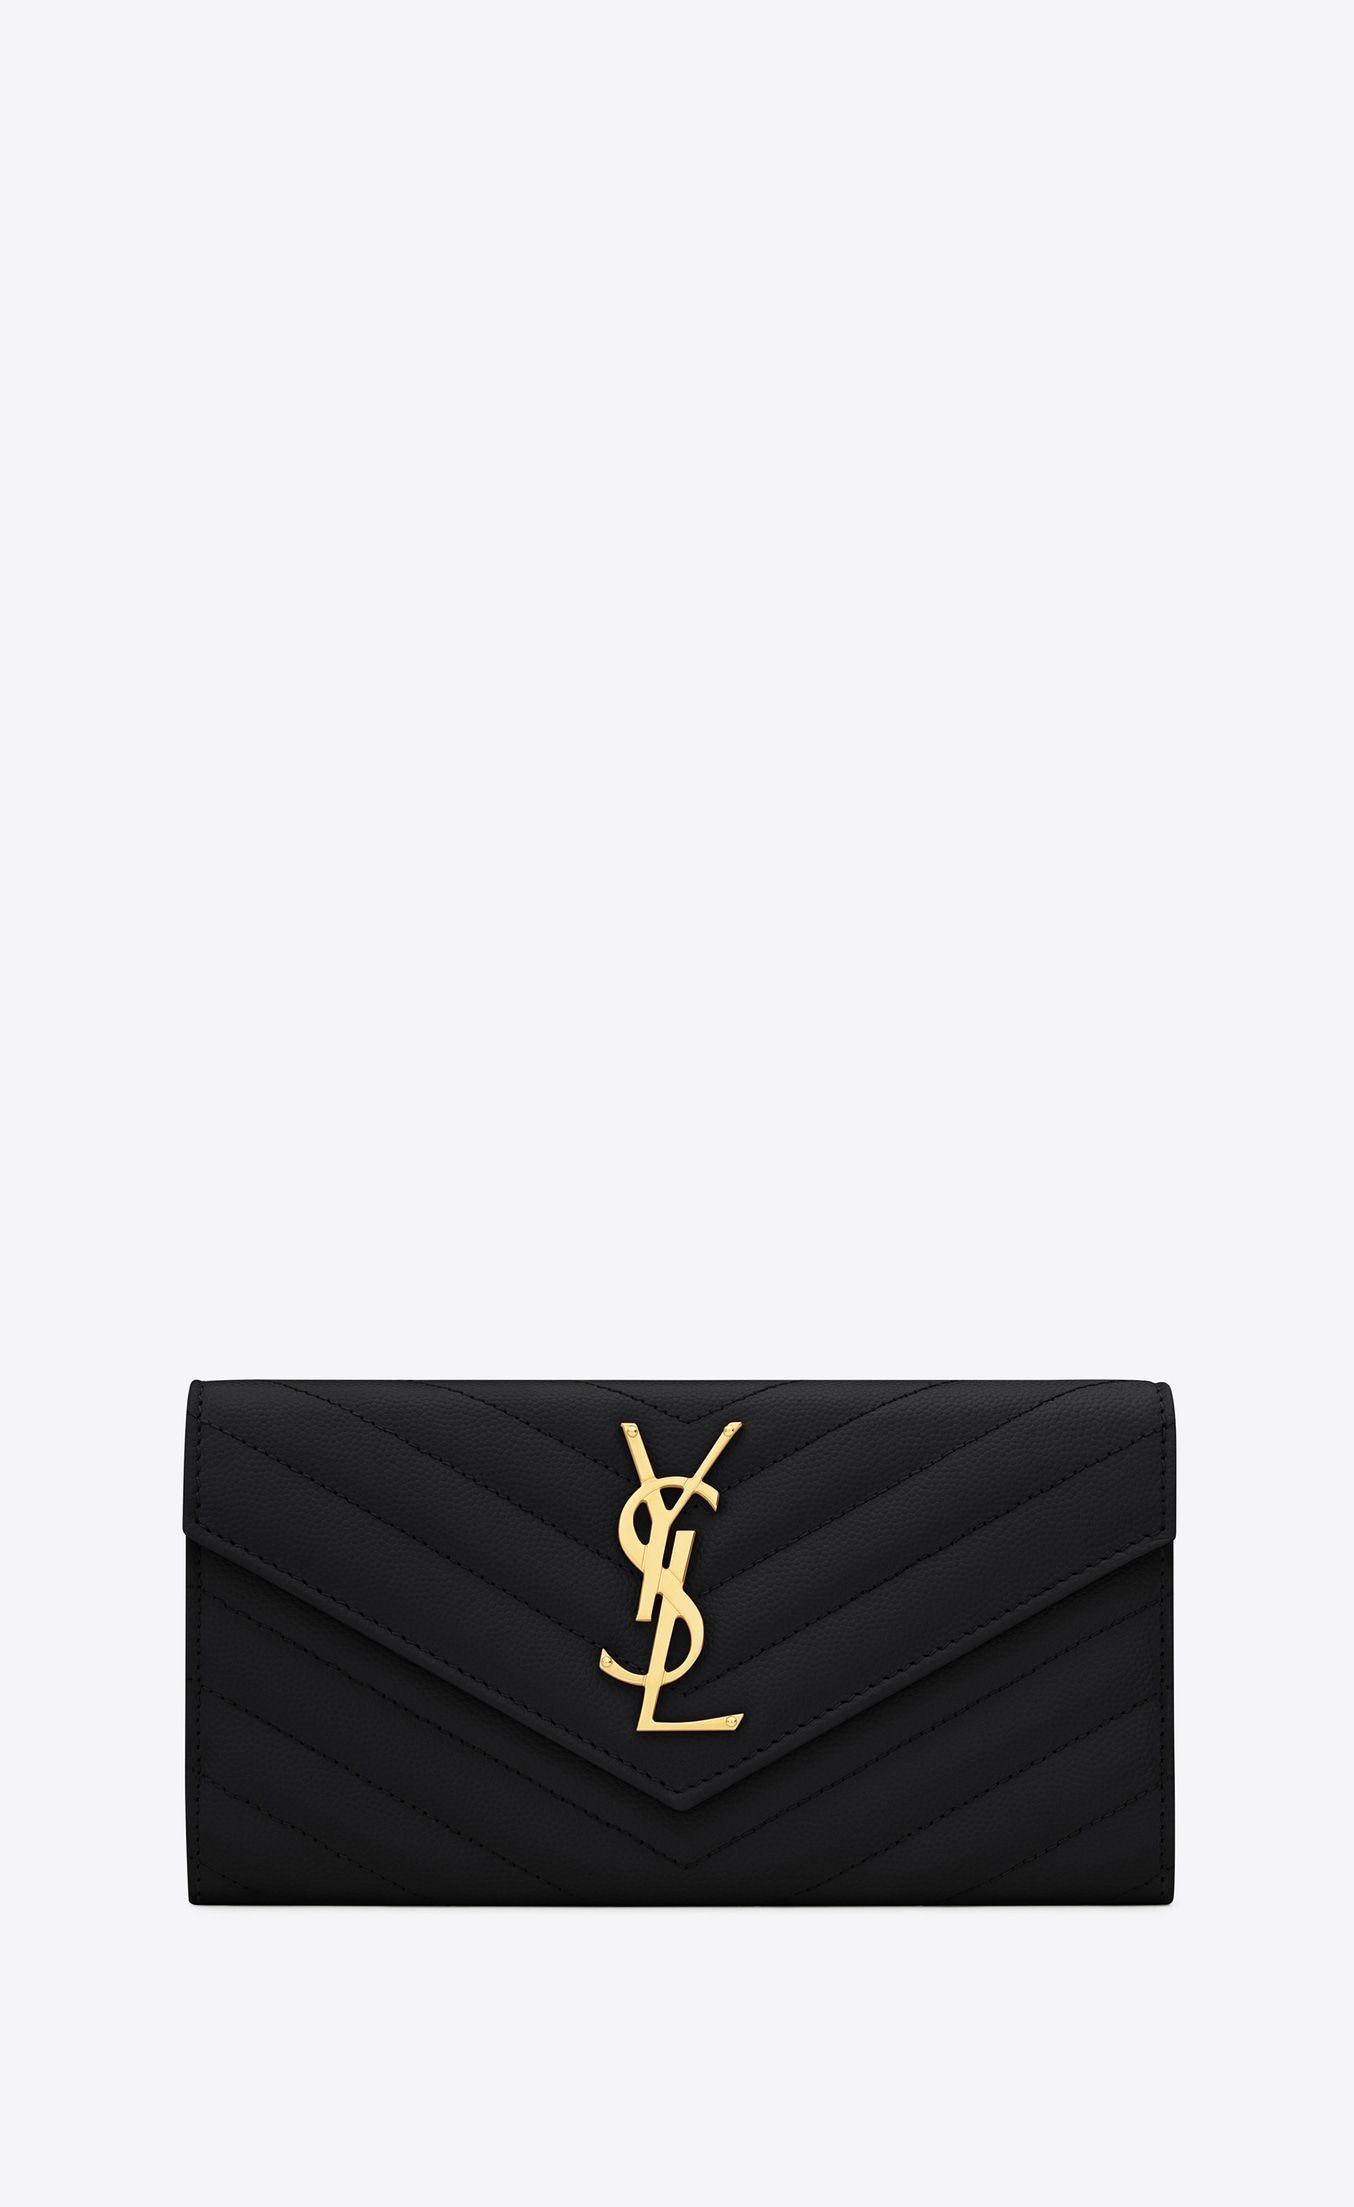 6ec3e0ae827 Monogram large flap wallet in grain de poudre embossed leather, Front view